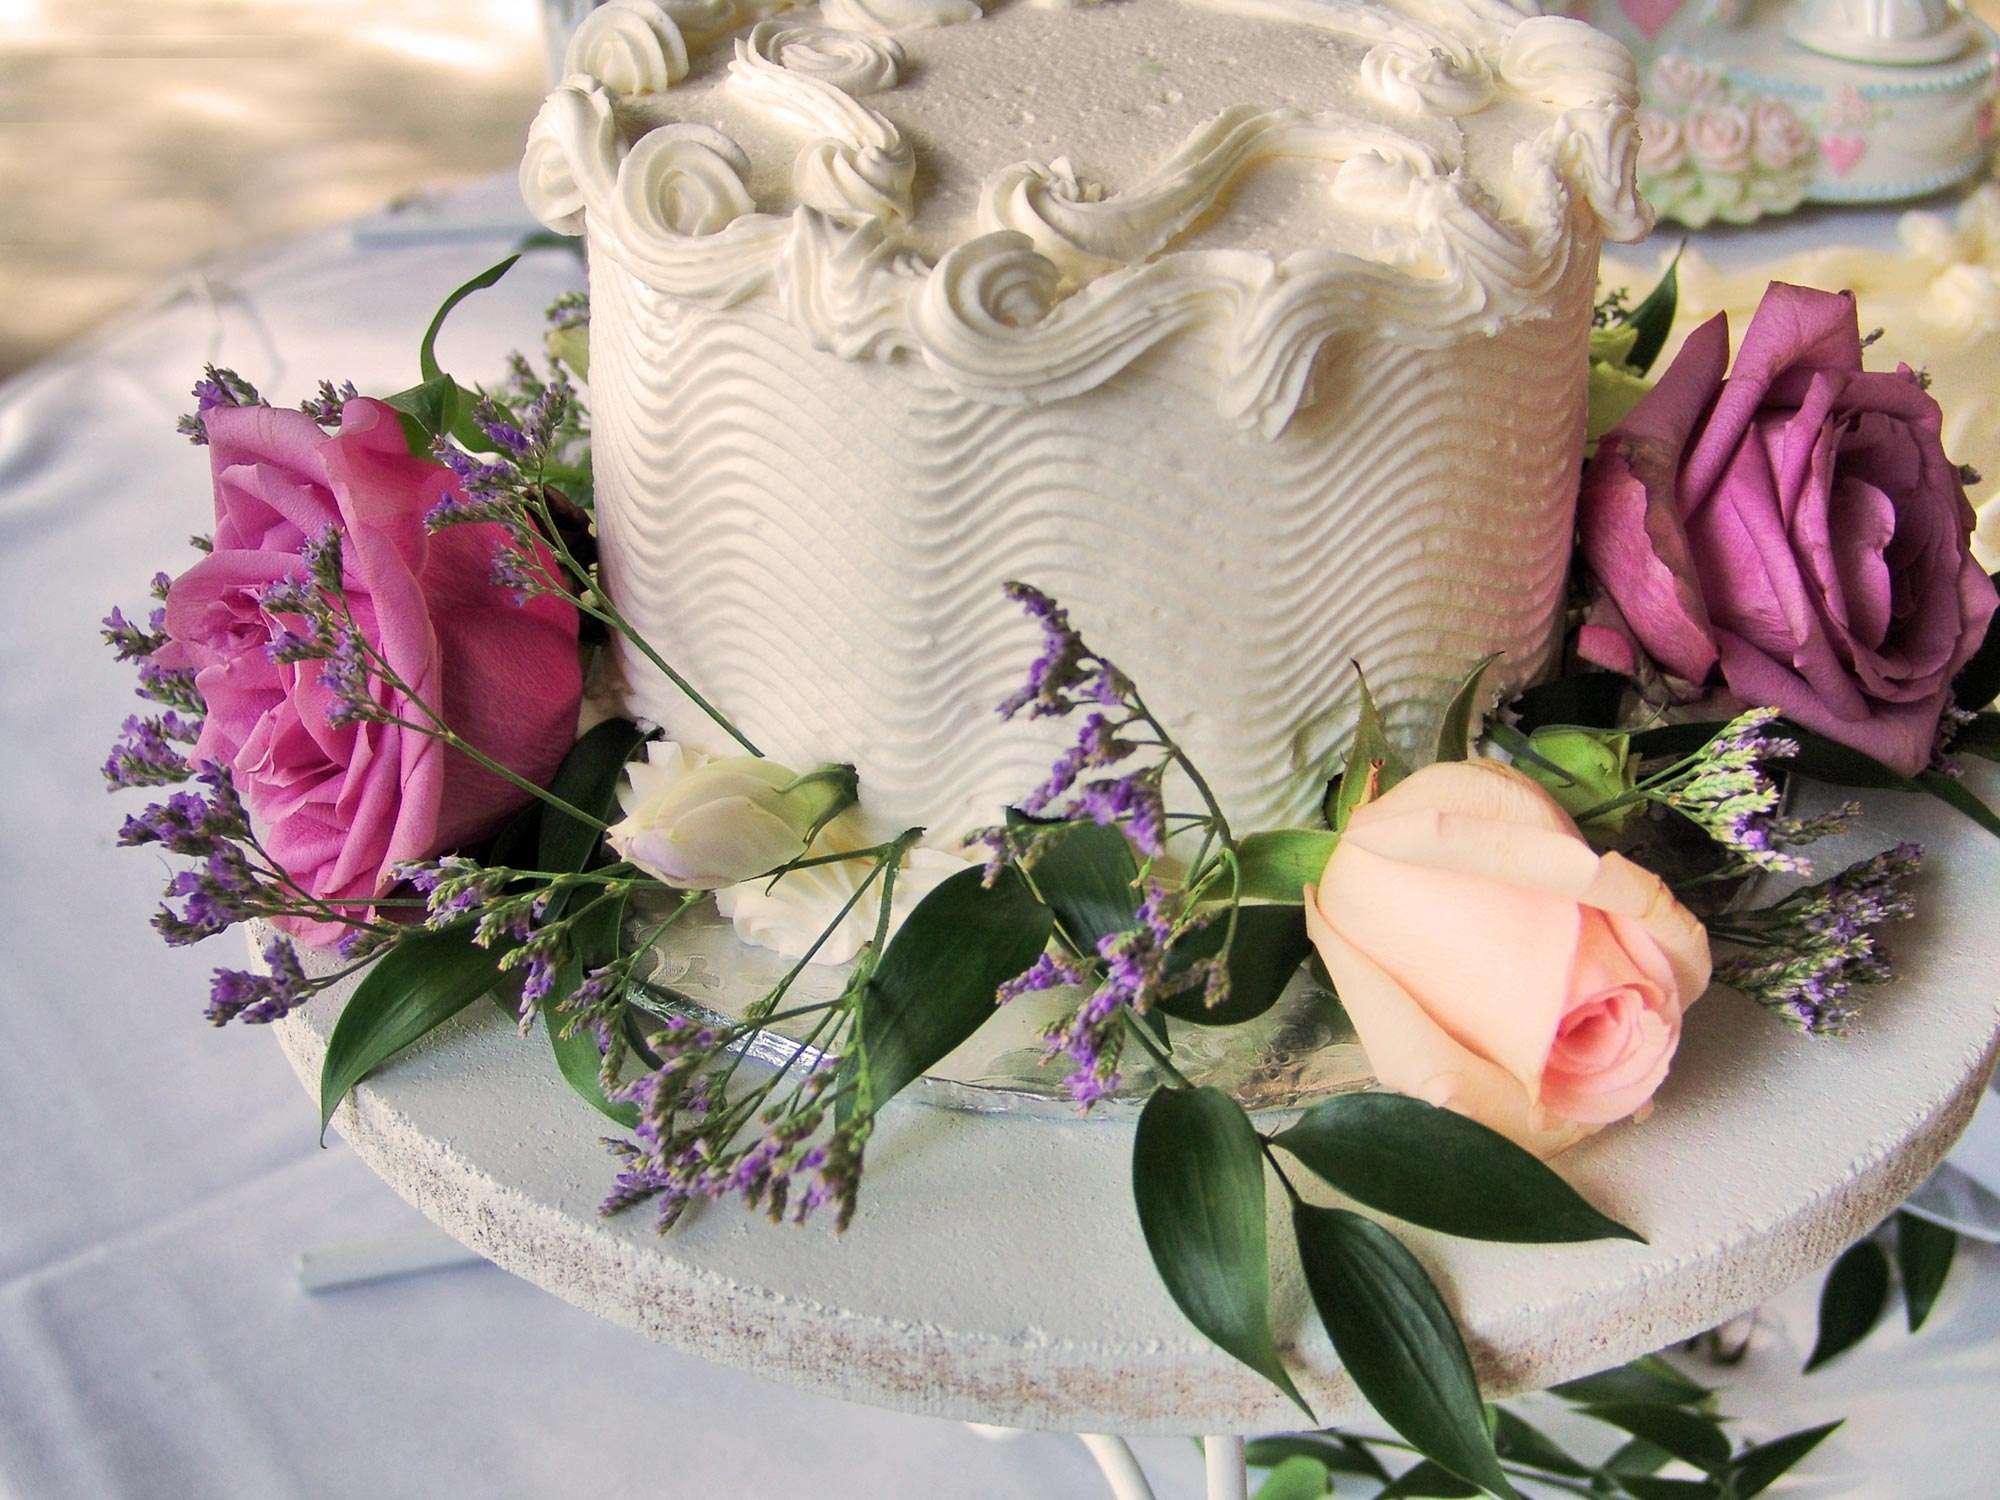 Freeze Your Wedding Cake